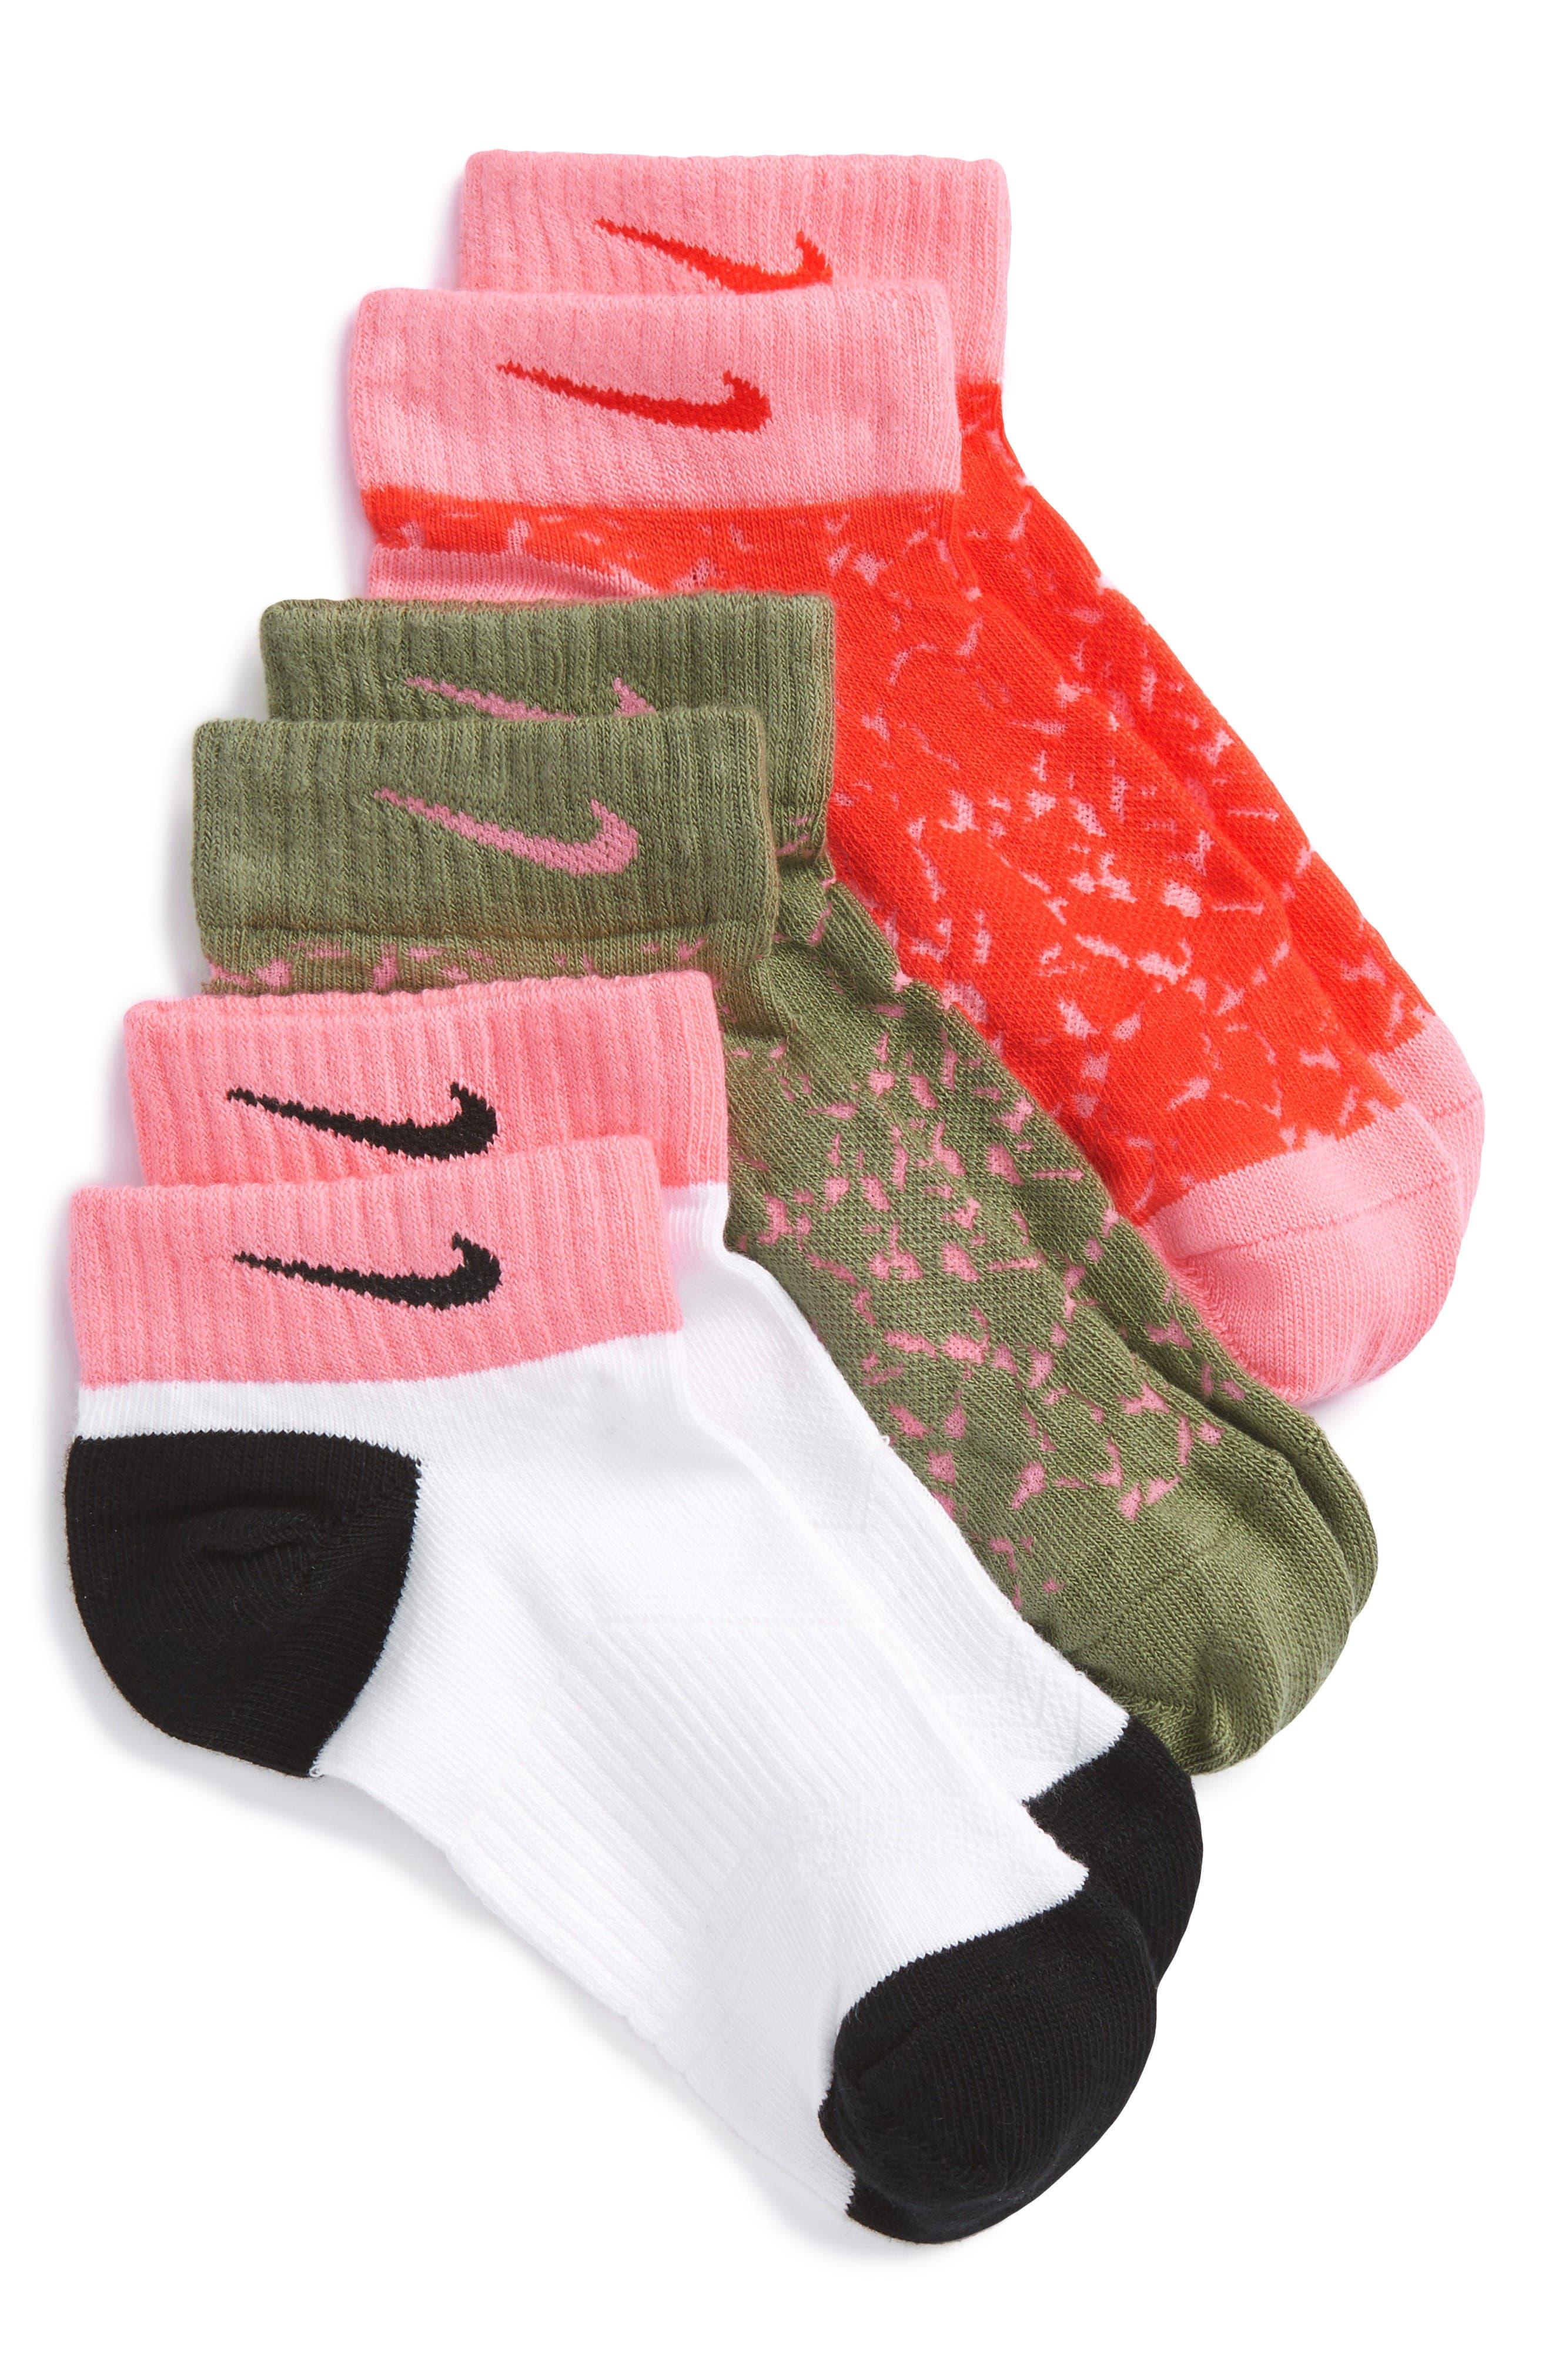 Nike Low Cut Graphic Socks (Kids)